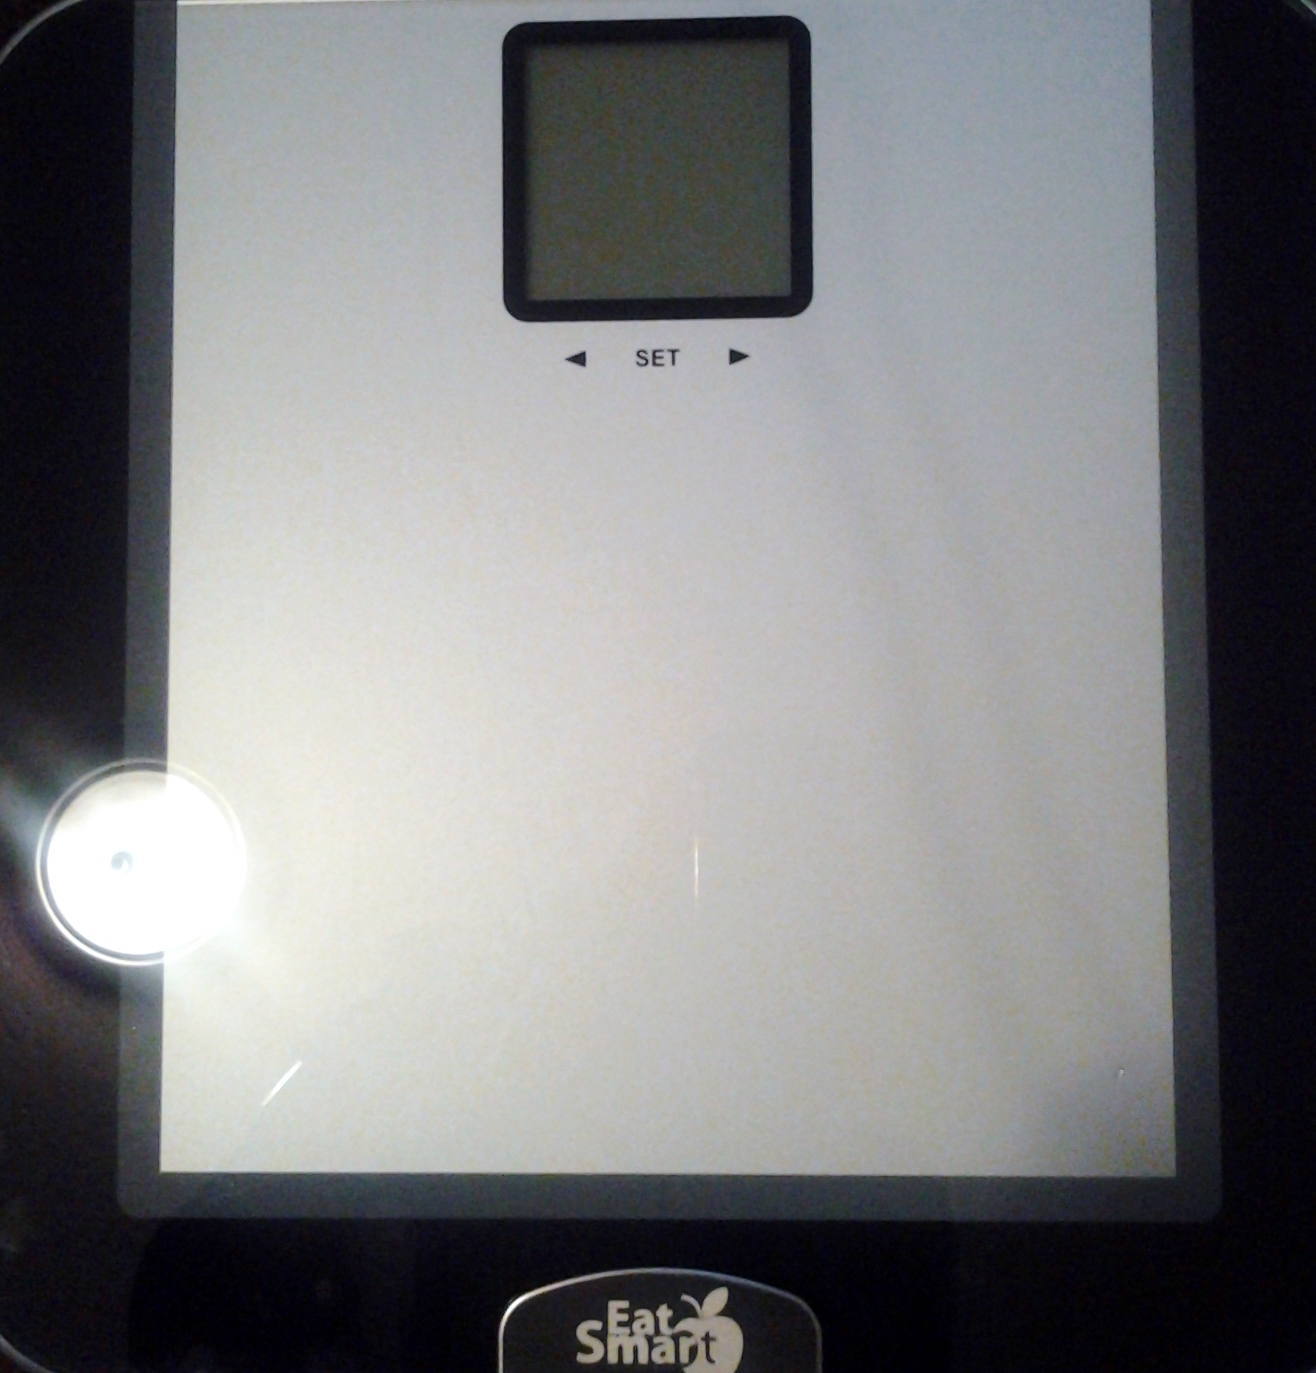 Precision tracker digital bathroom scale review emily - How to calibrate a bathroom scale ...